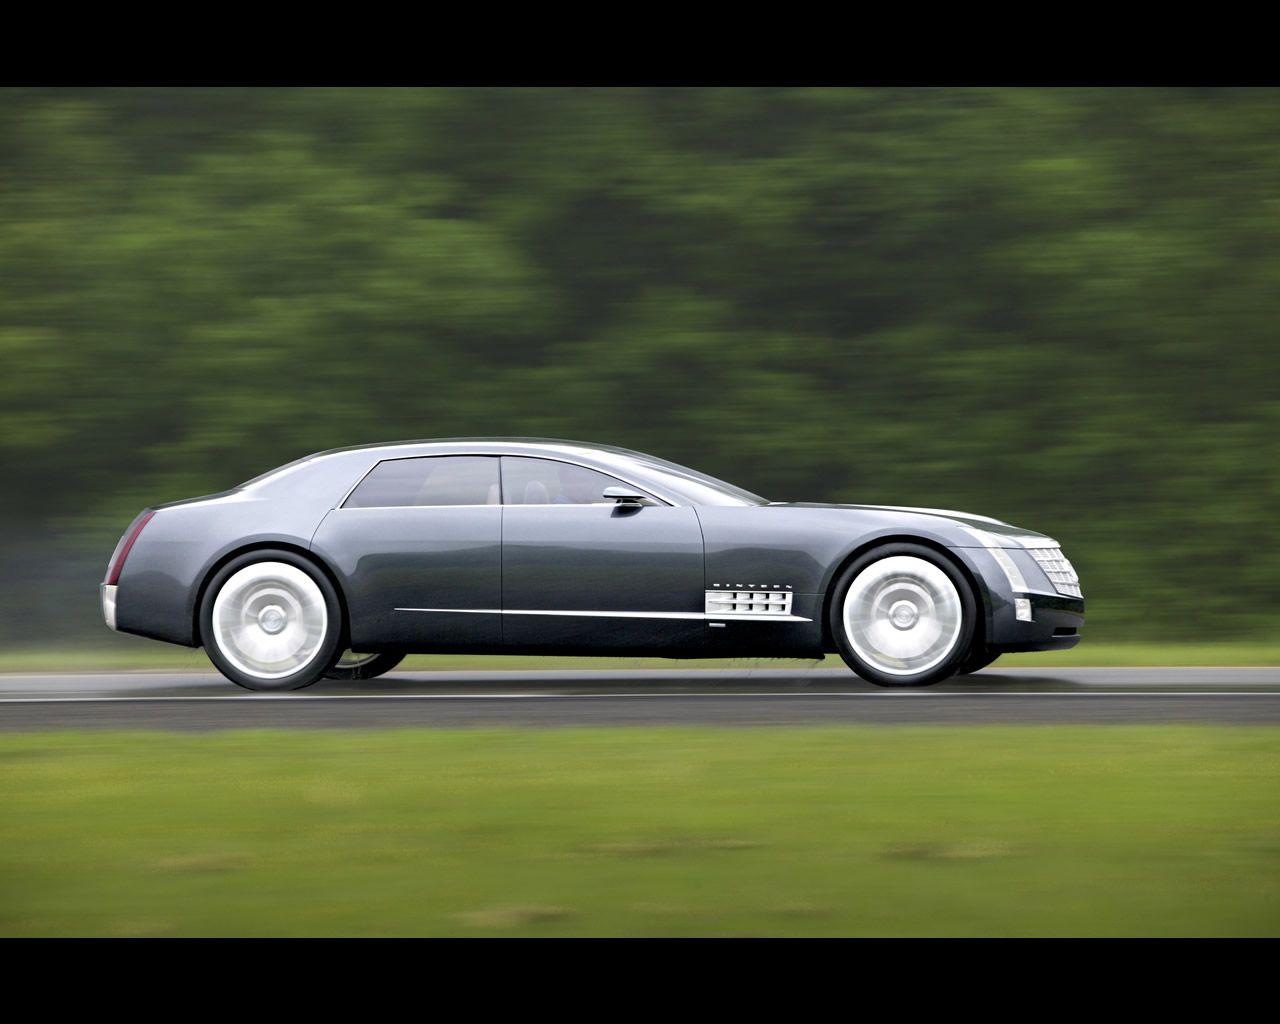 Cadillac Sixteen Concept 4x4 De 2003 Motor V16 De 13 600 Cc Y 1013